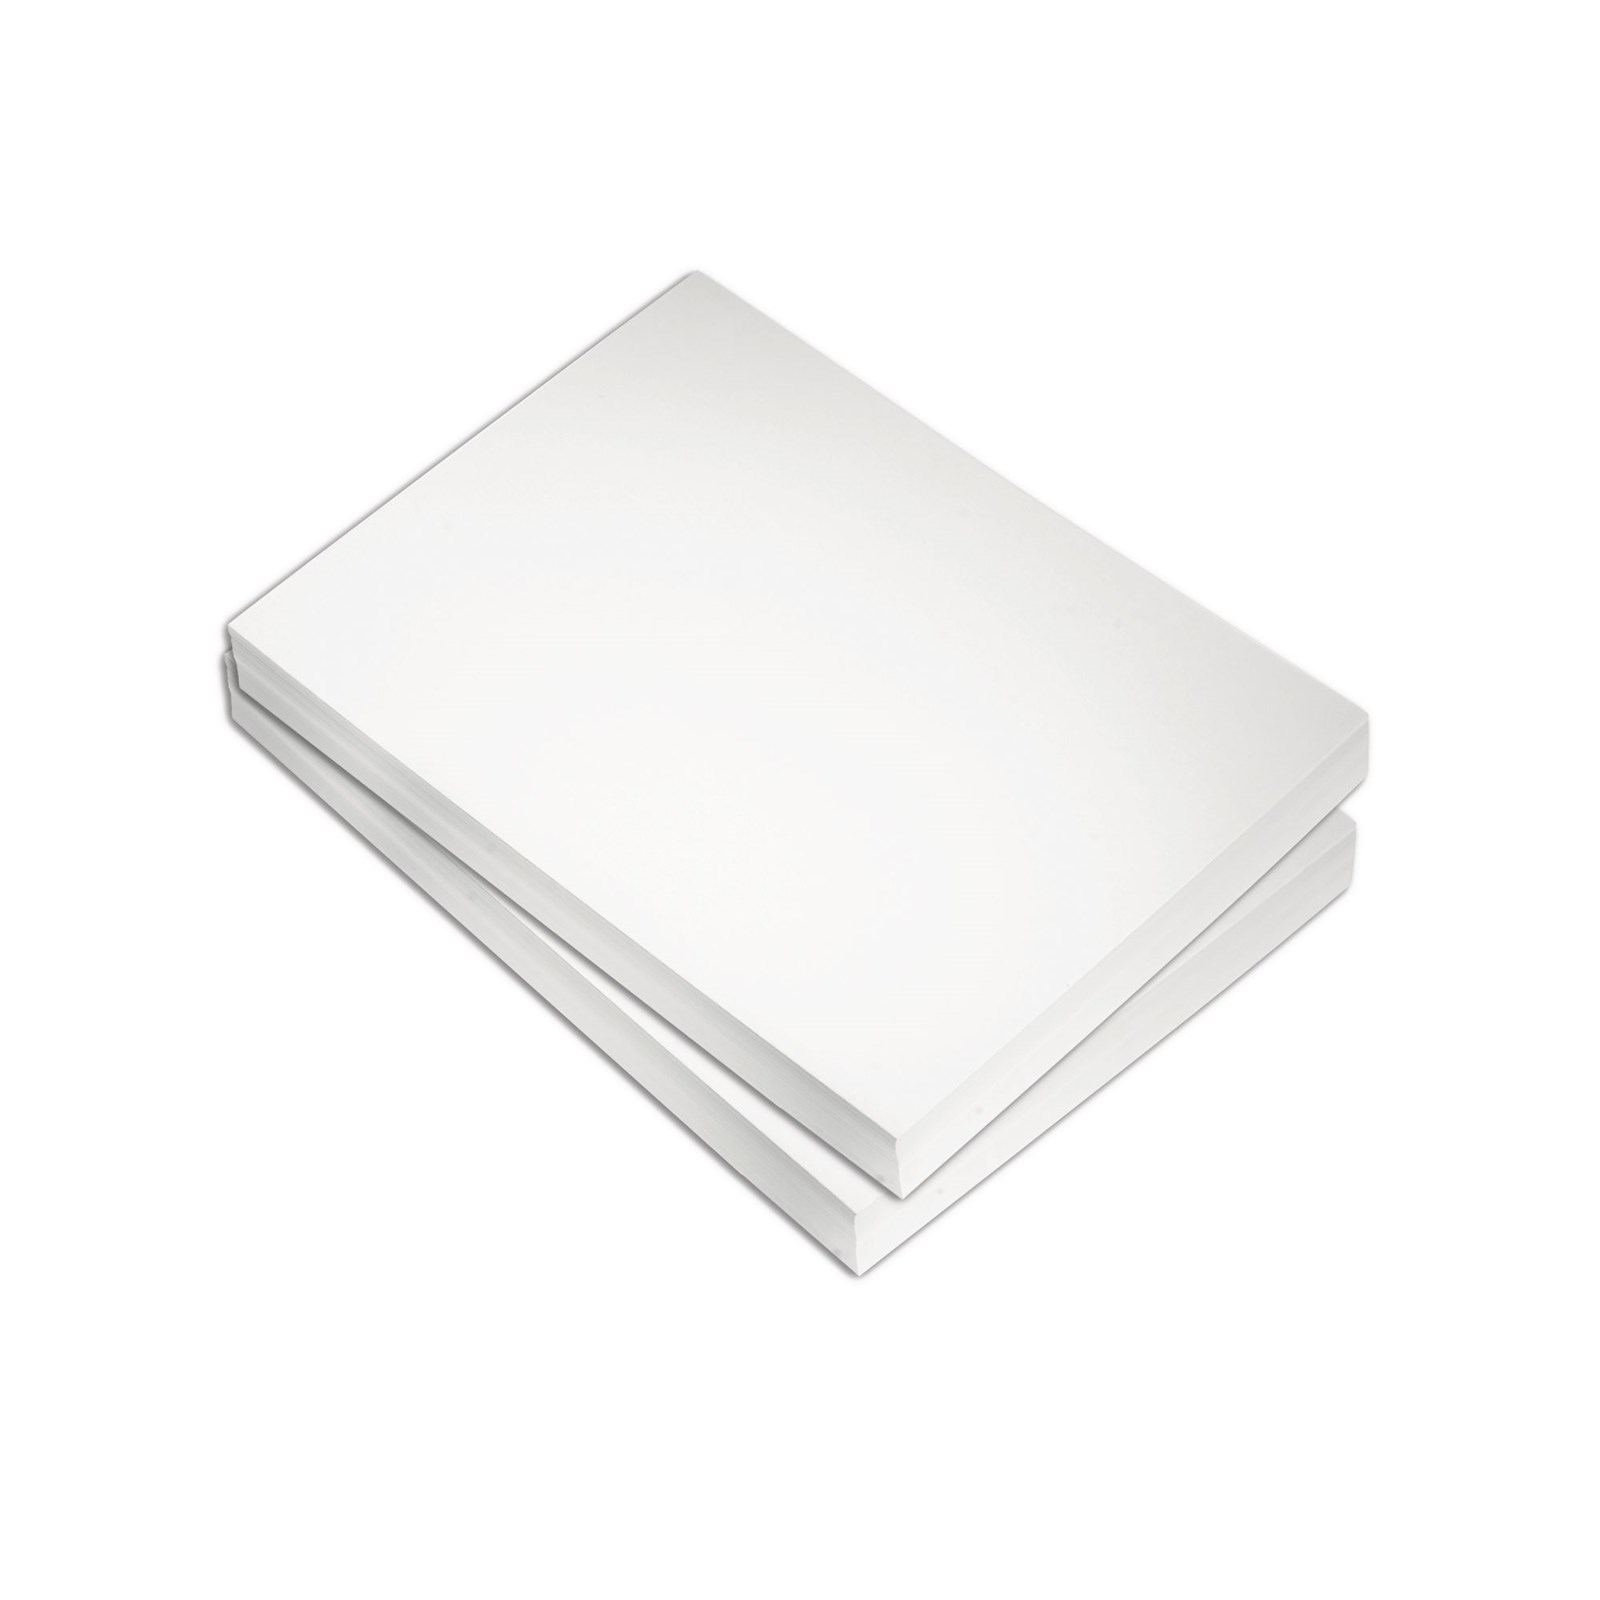 Bumper Card - Pack A4 280 Micron - Pack of 100